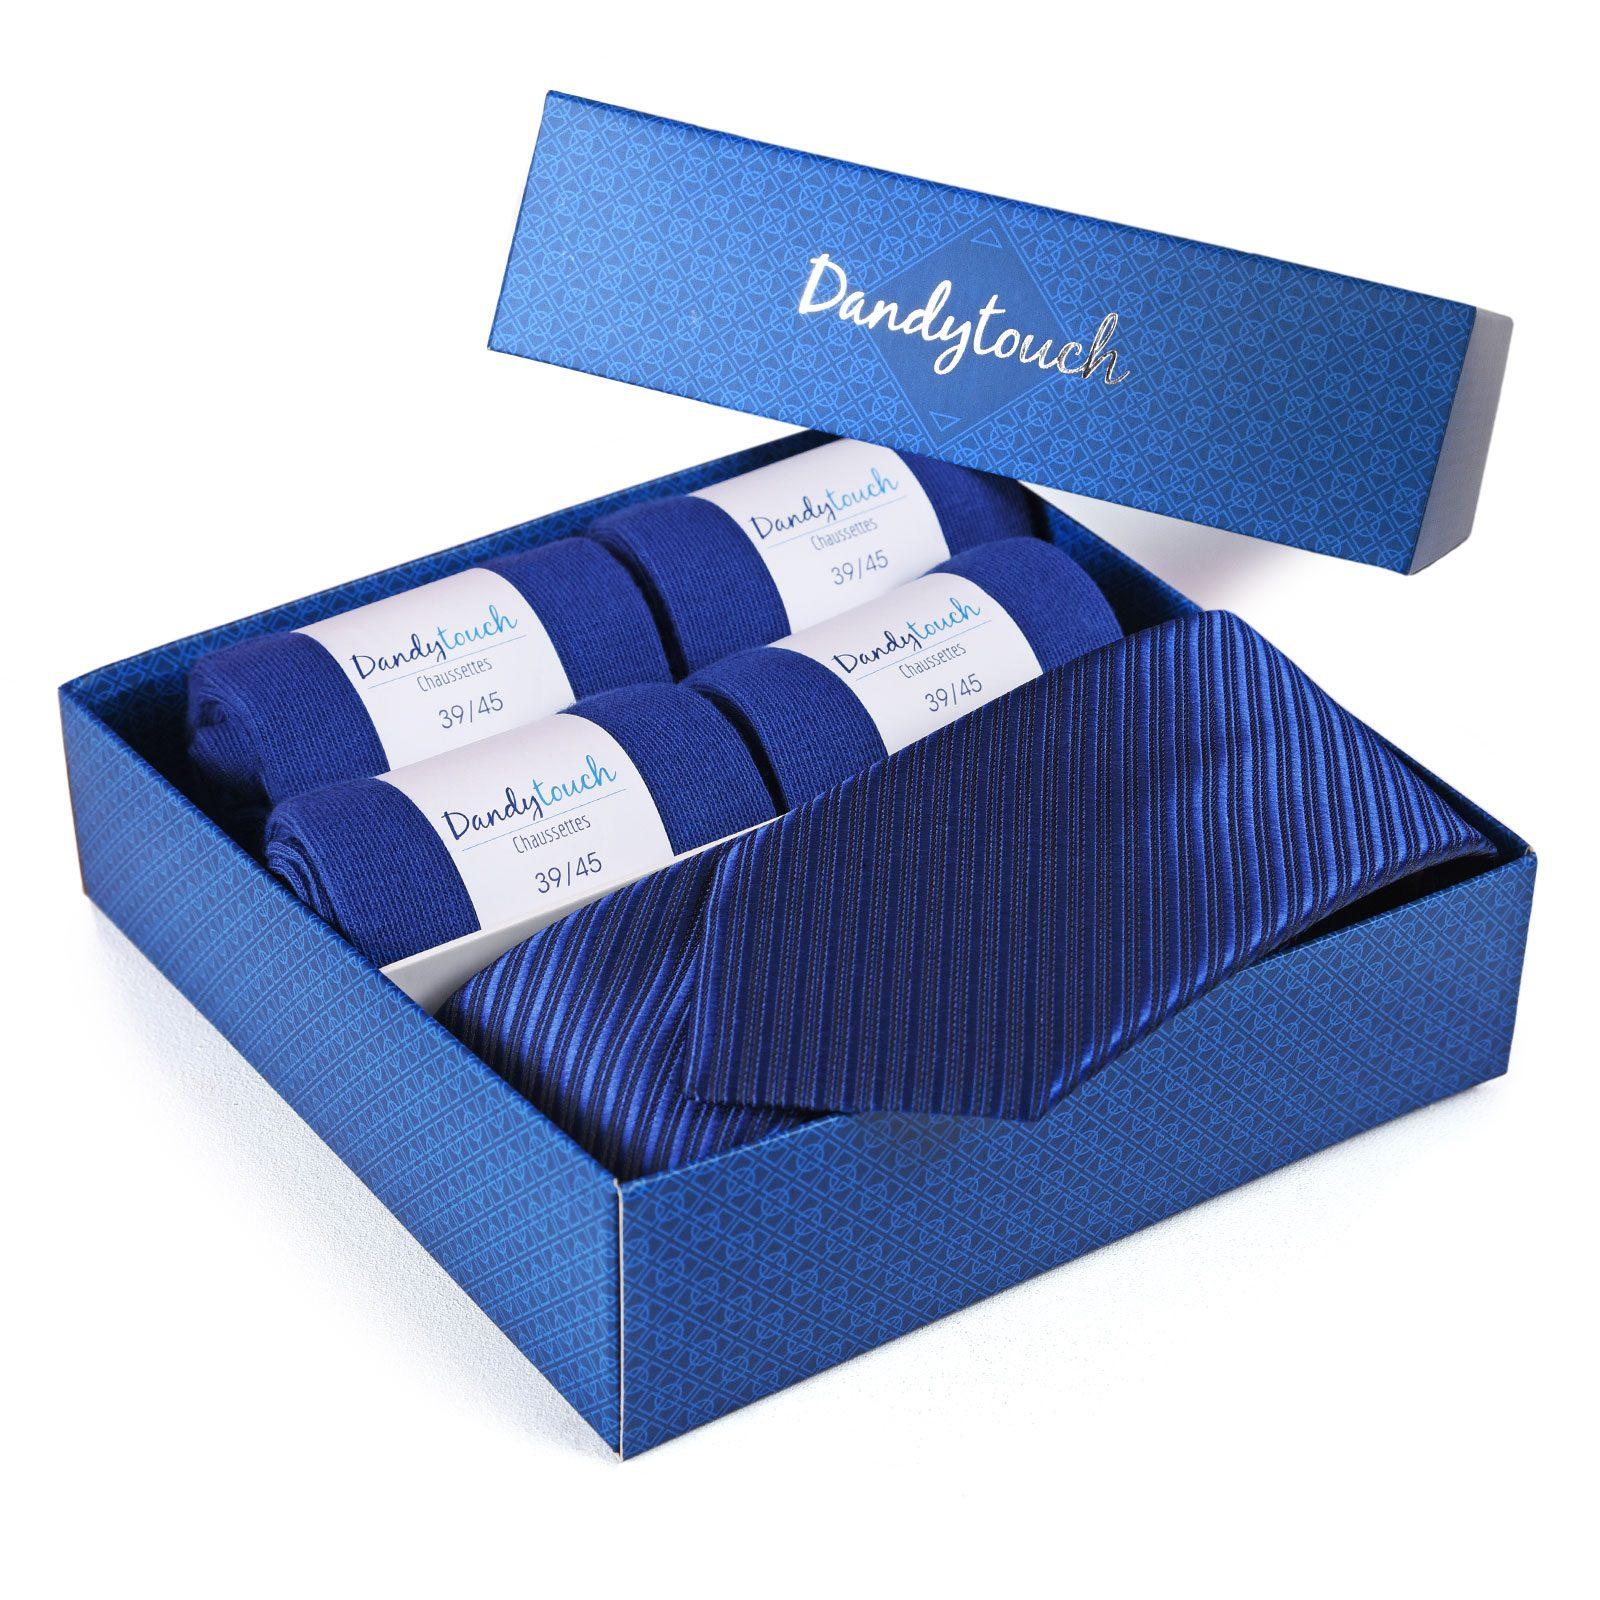 http://lookbook.allee-du-foulard.fr/wp-content/uploads/2018/12/PK-00088-B16-coffret-cadeau-chaussettes-cravate-bleu-1600x1600.jpg